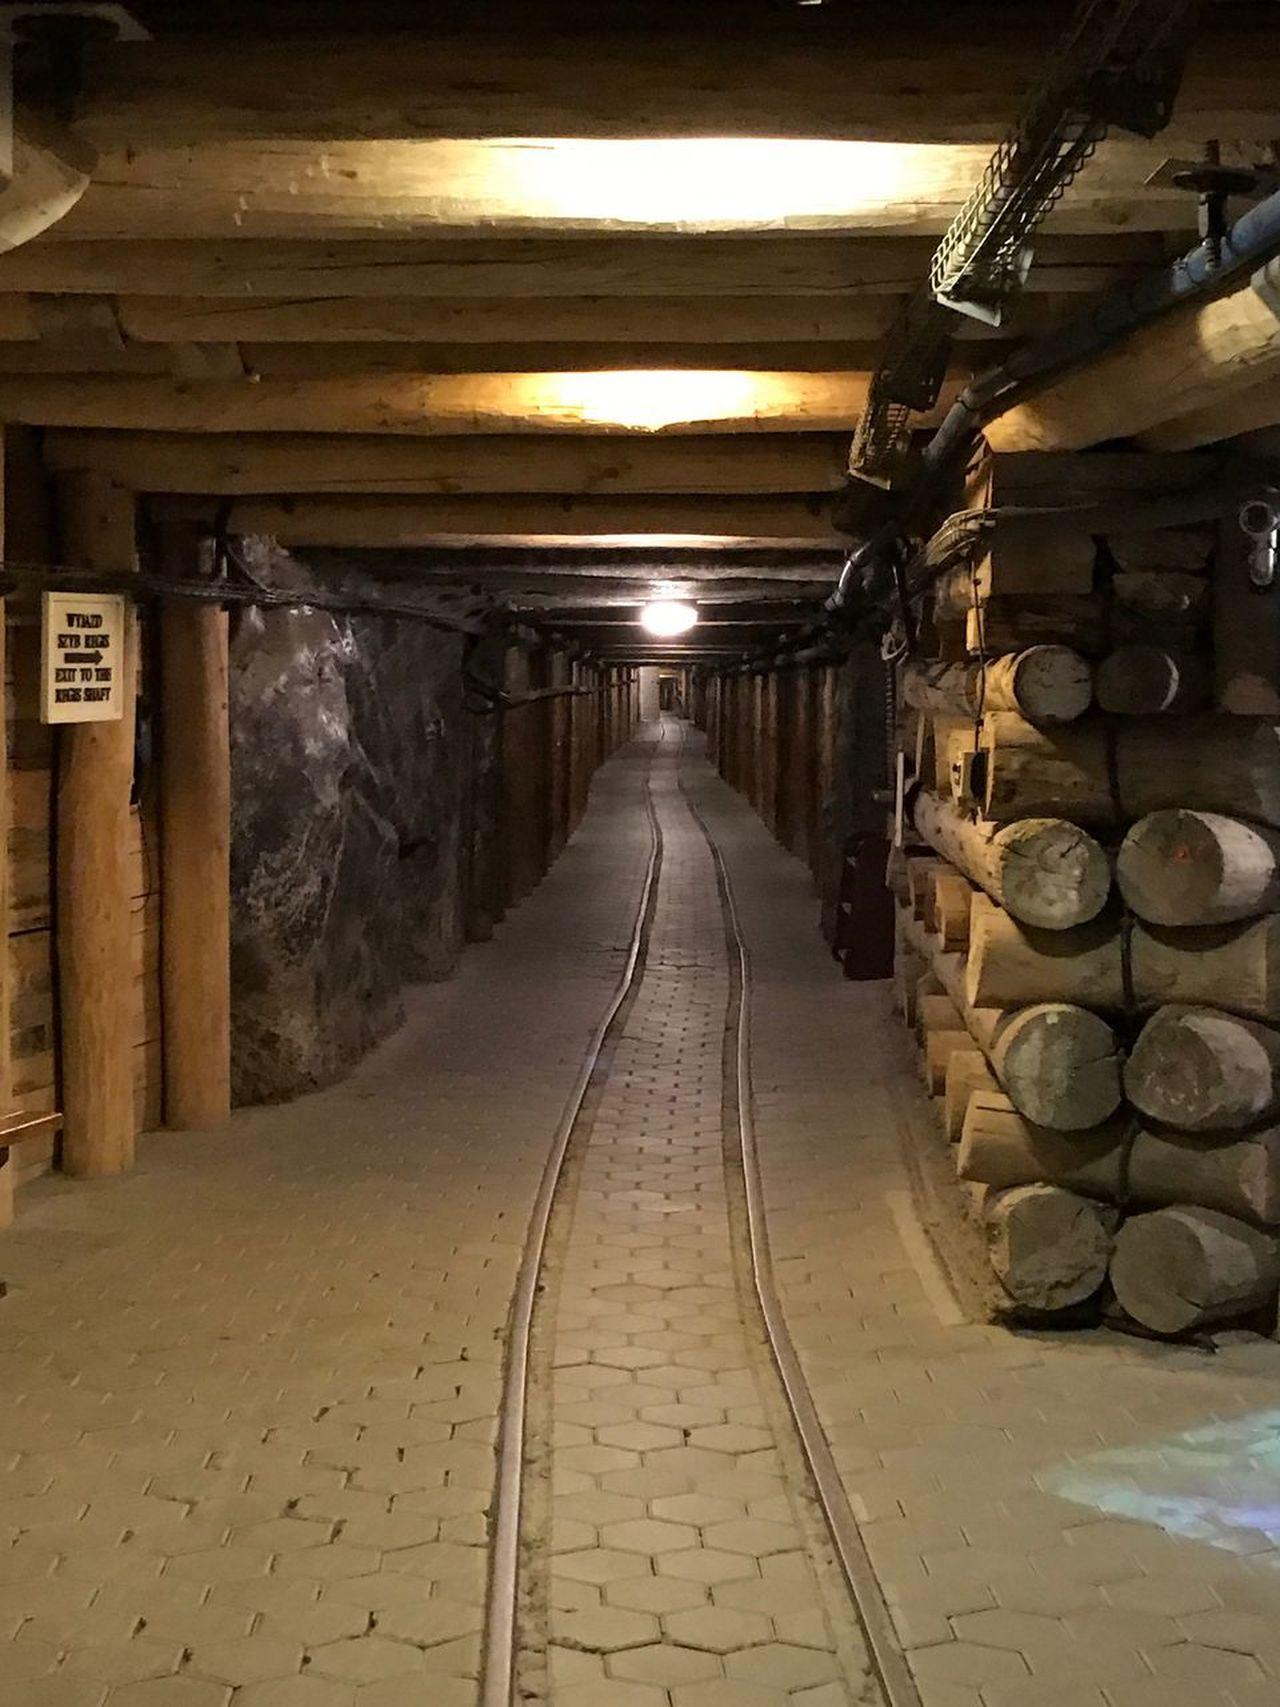 Salt Mine Salt - Mineral Indoors  No People Illuminated Underground Passage Wood - Material The Way Forward Tunnel